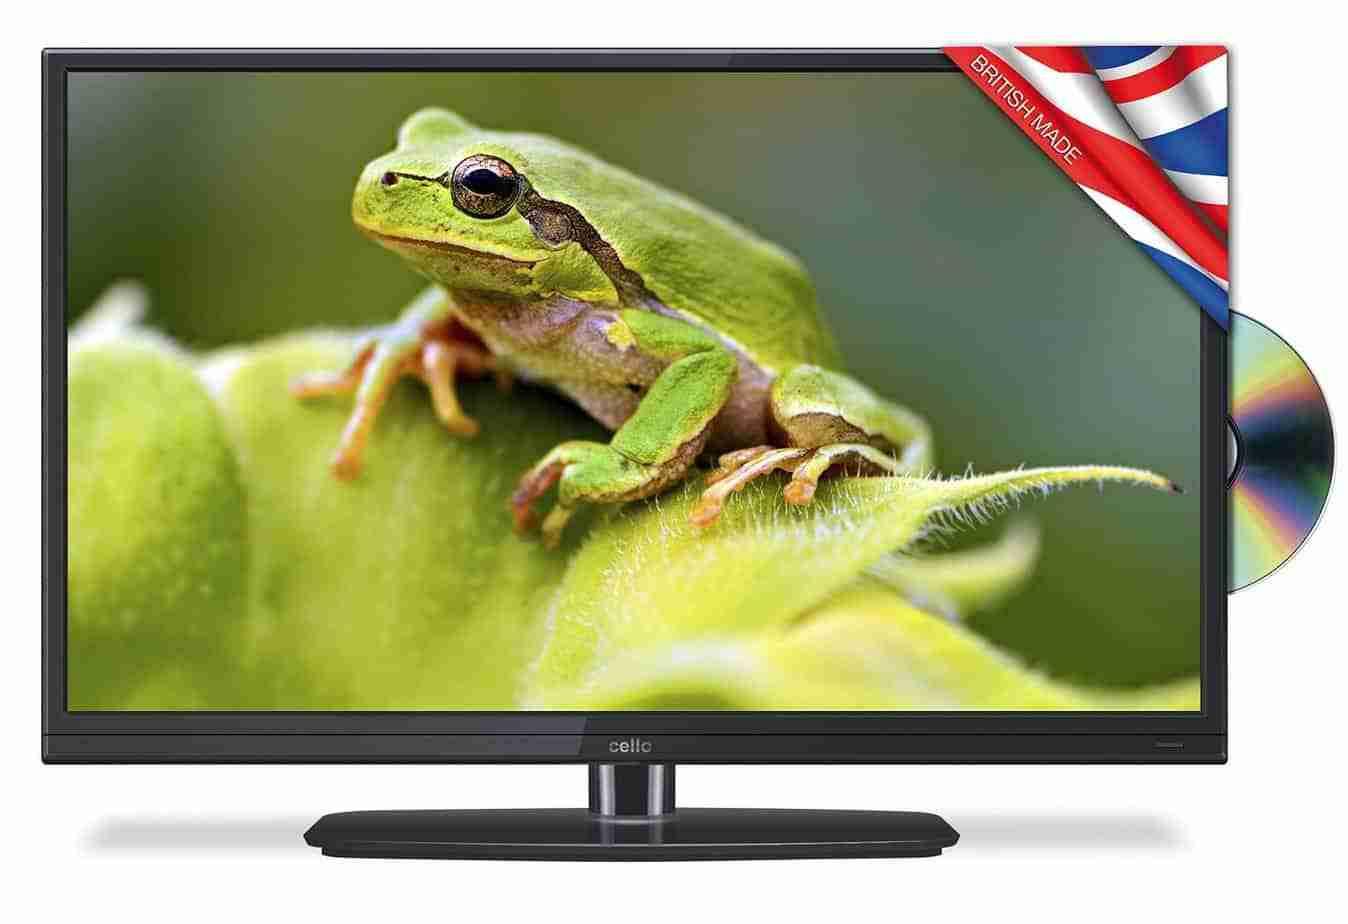 Cello C22230F 22-inch TV for Motorhome